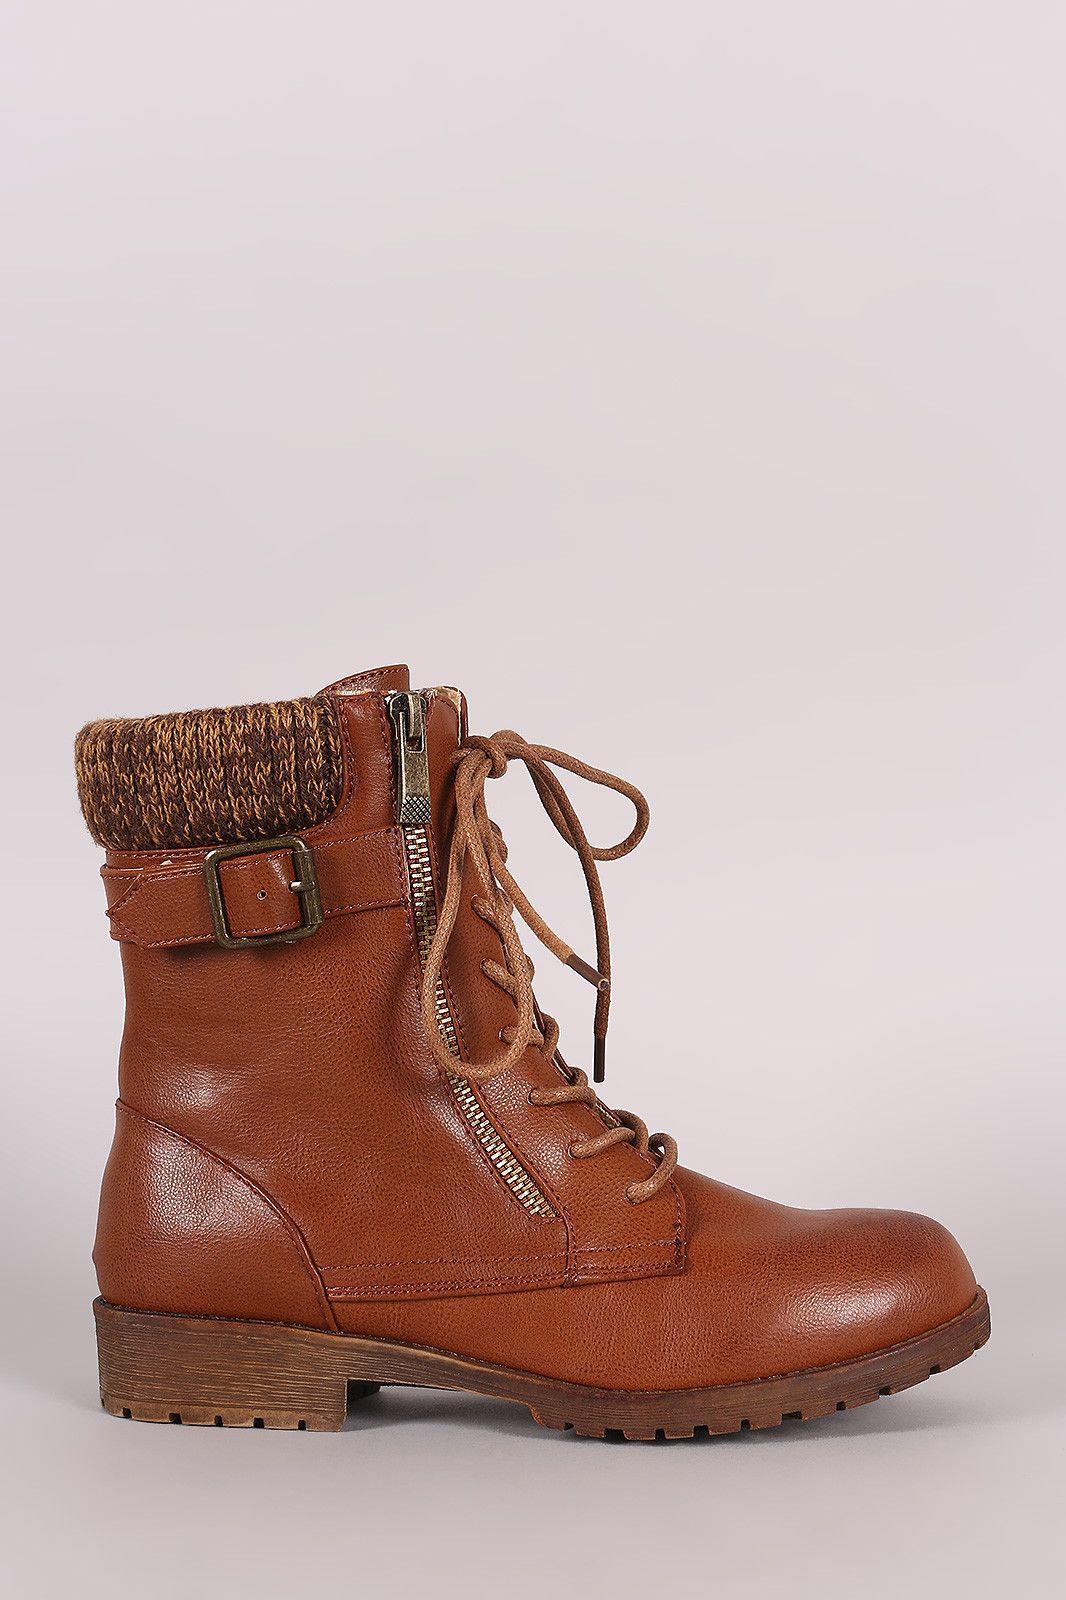 Bamboo Sweater Cuff Combat Lug Boots Leather Men Vegan Leather